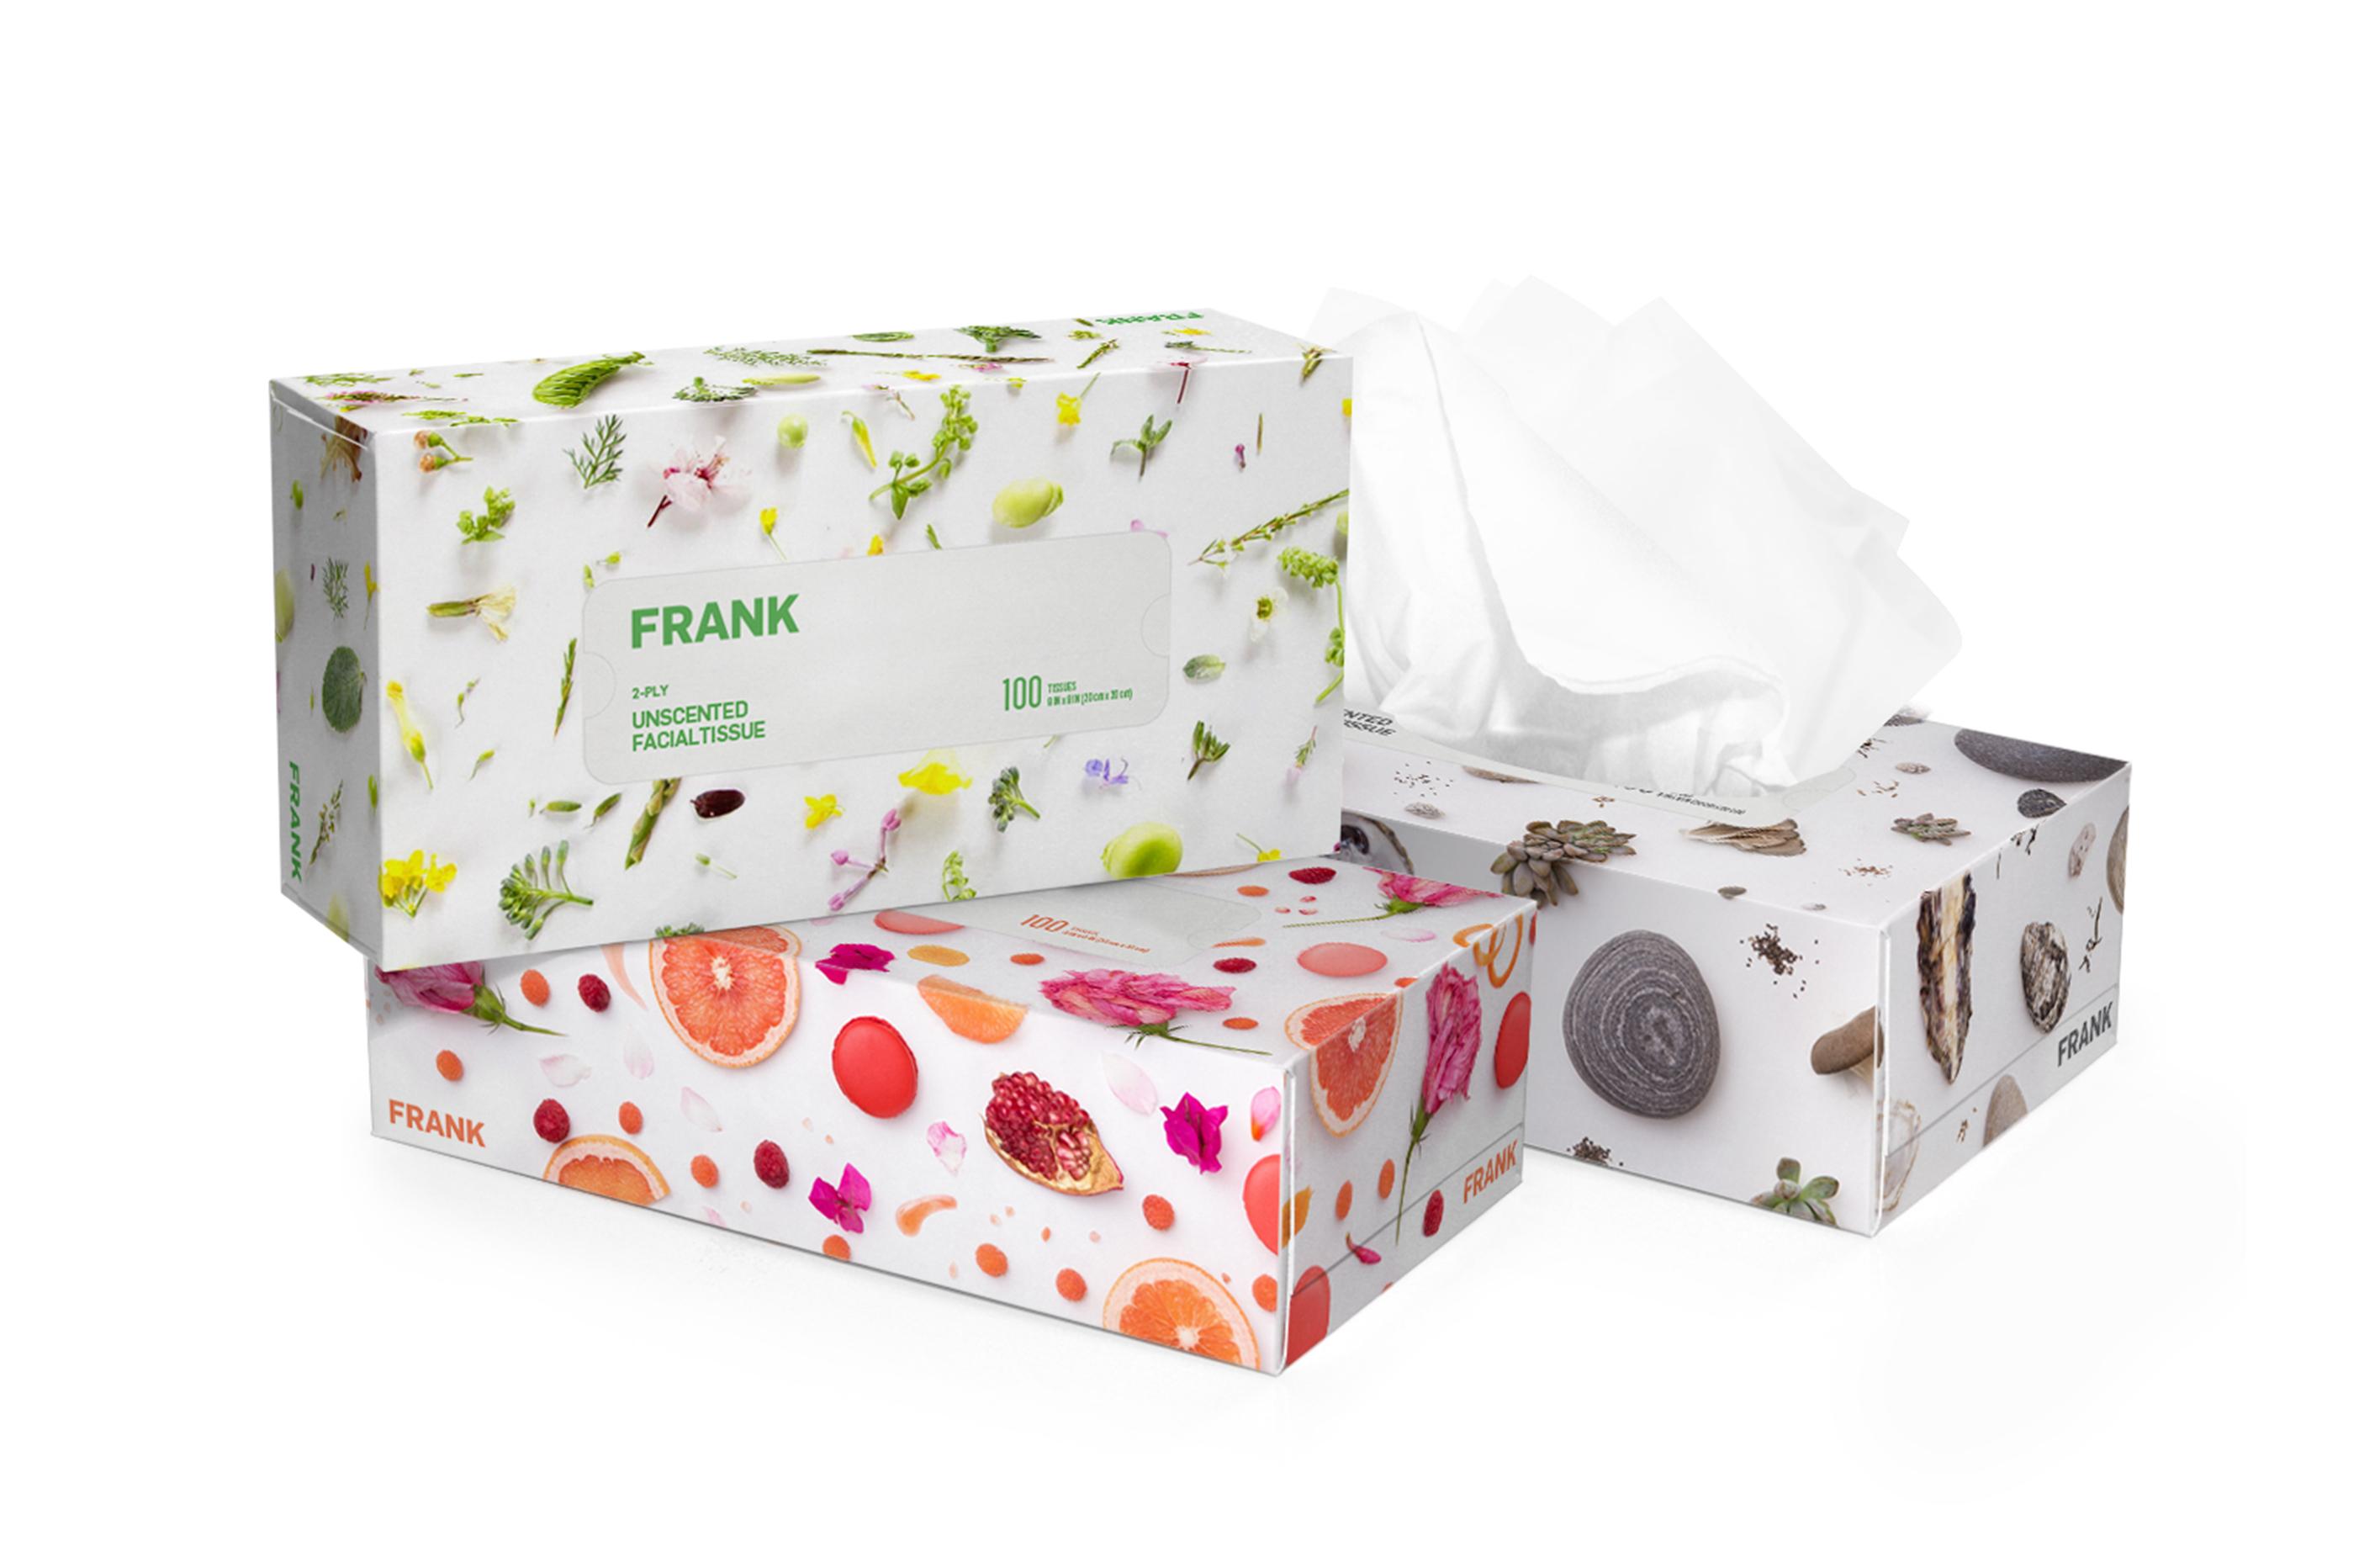 Frank Tissues